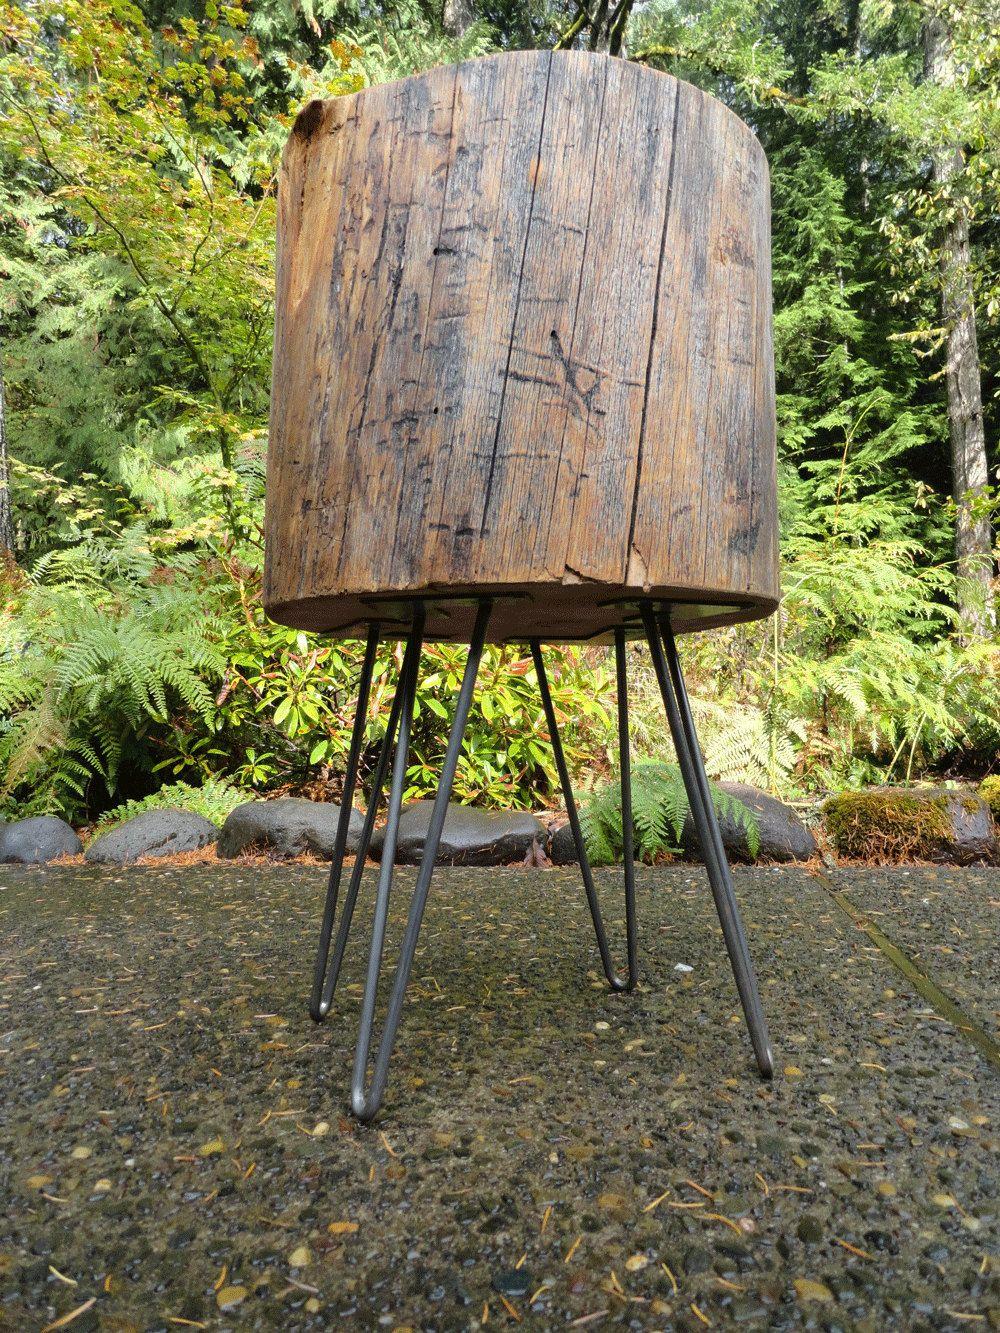 Massive Hardwood Stump table with hairpin legs